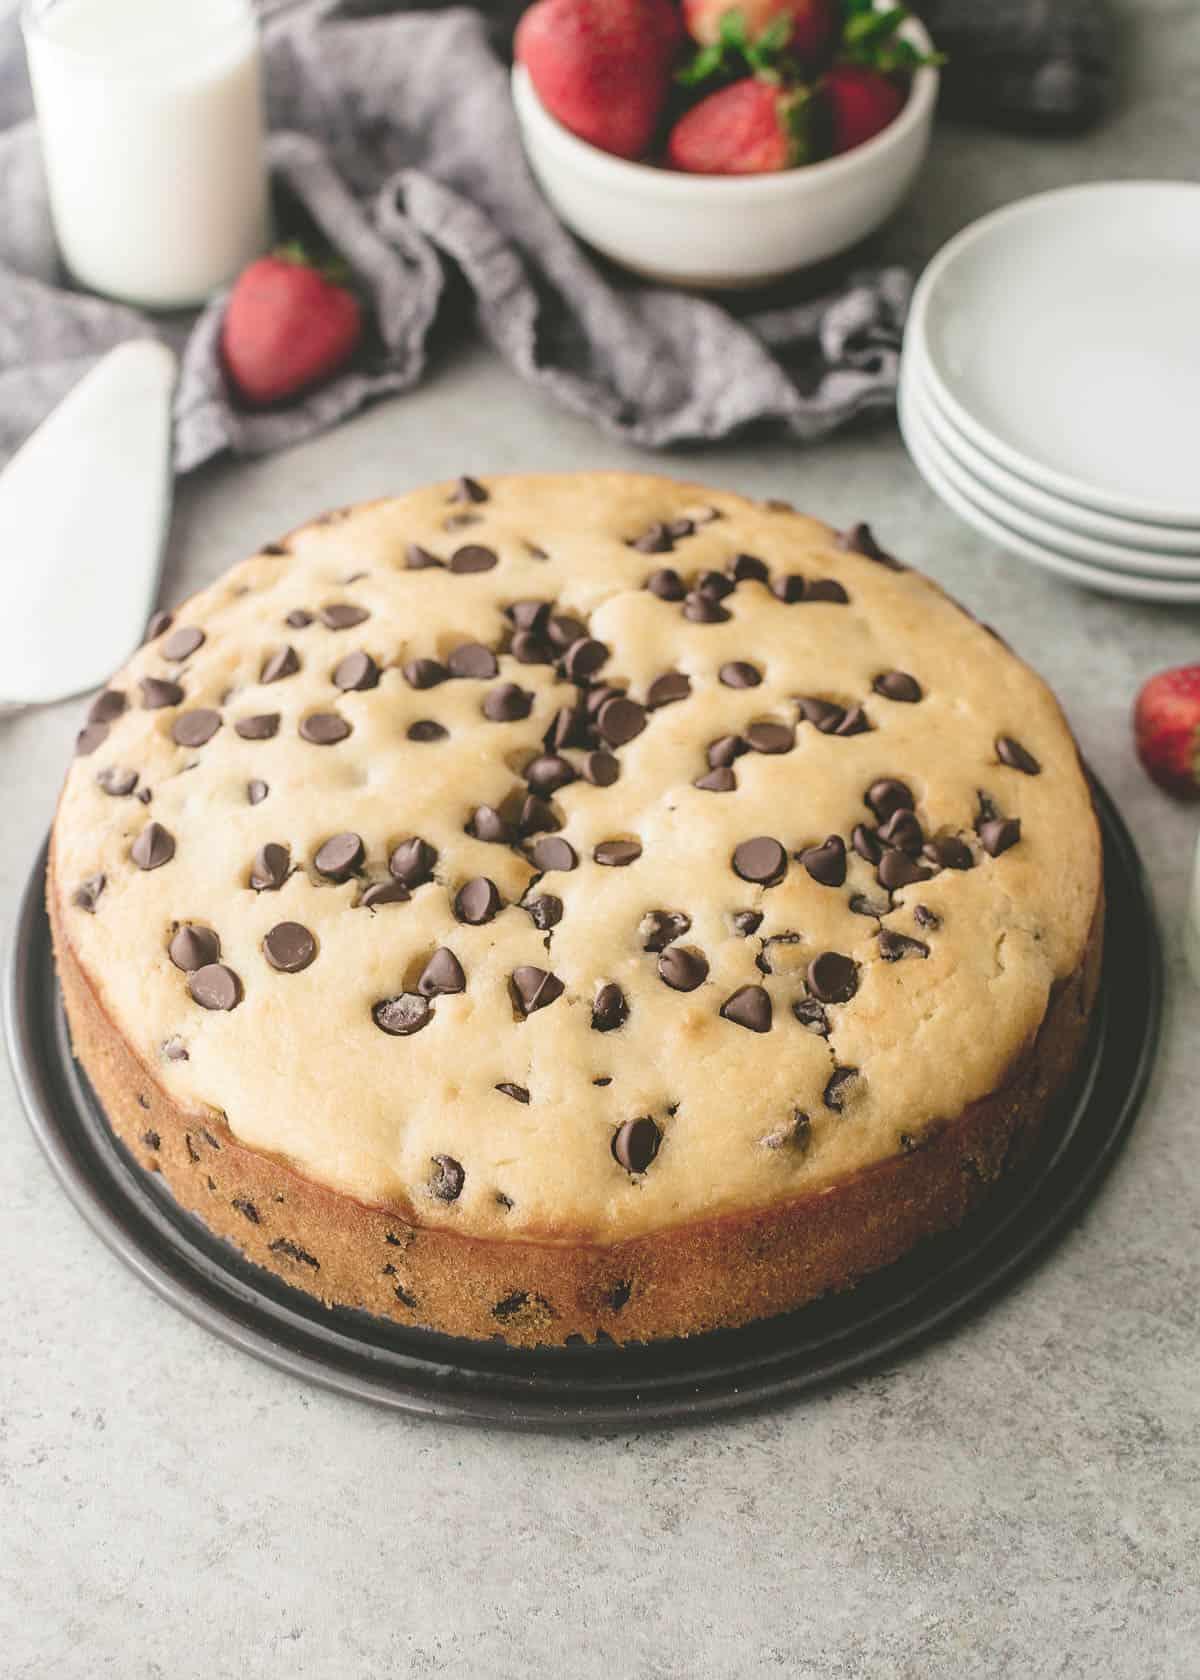 uncut chocolate chip ricotta cake